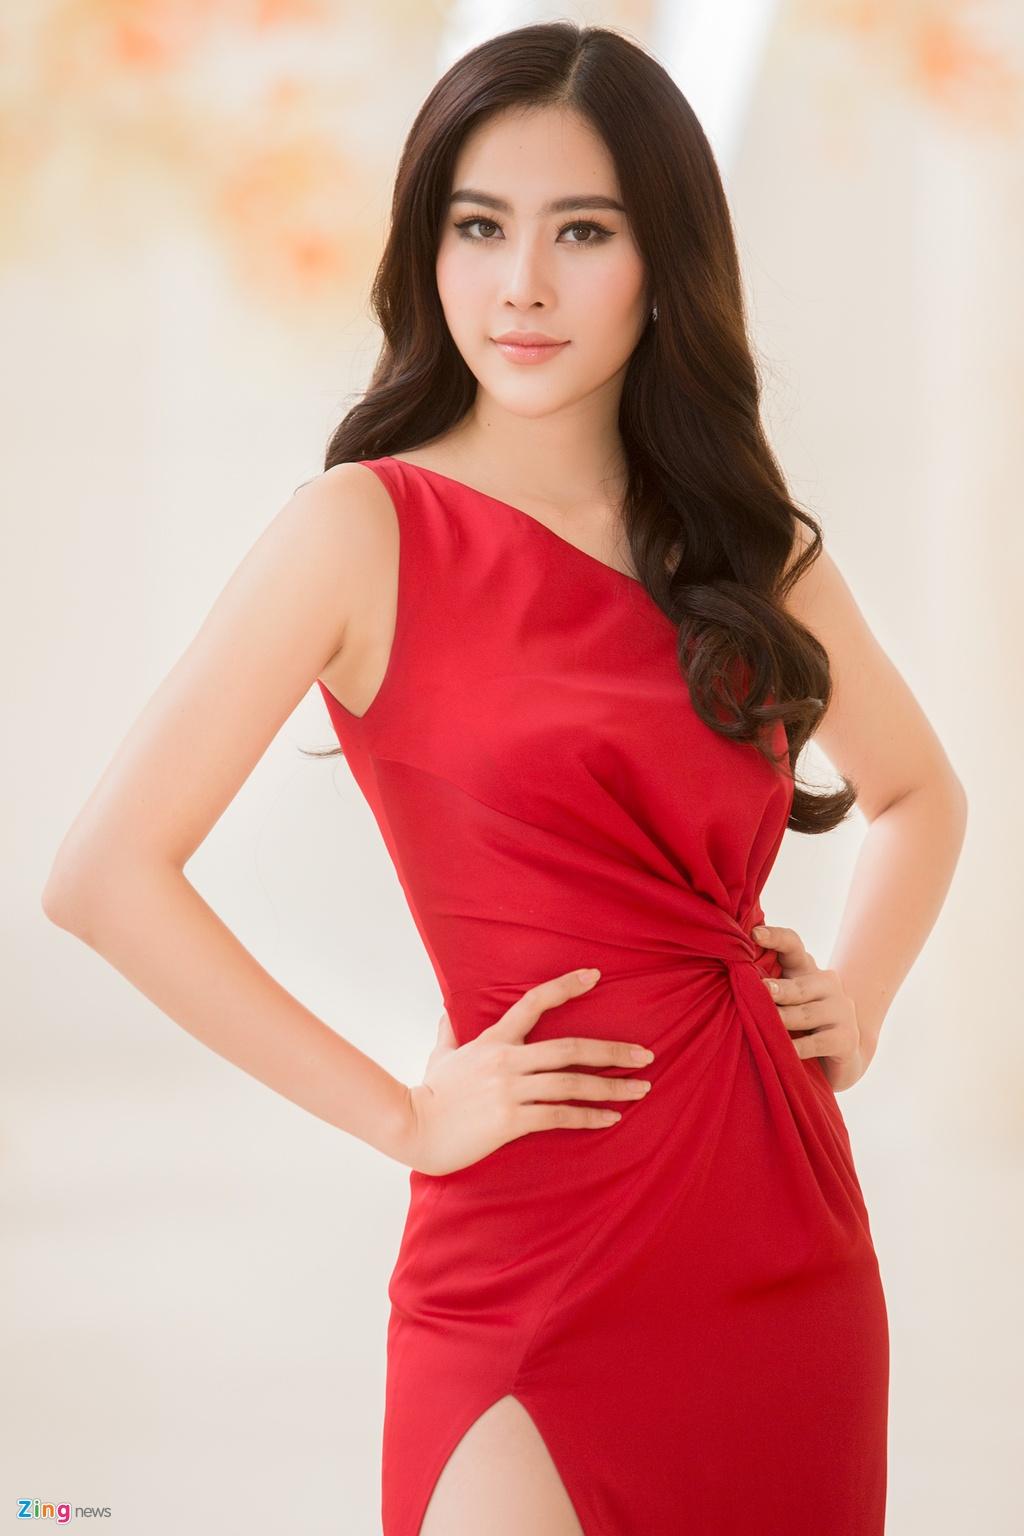 Hoa khoi Nam Em: 'Toi muon yeu dan ong da ly hon va co con rieng' hinh anh 3